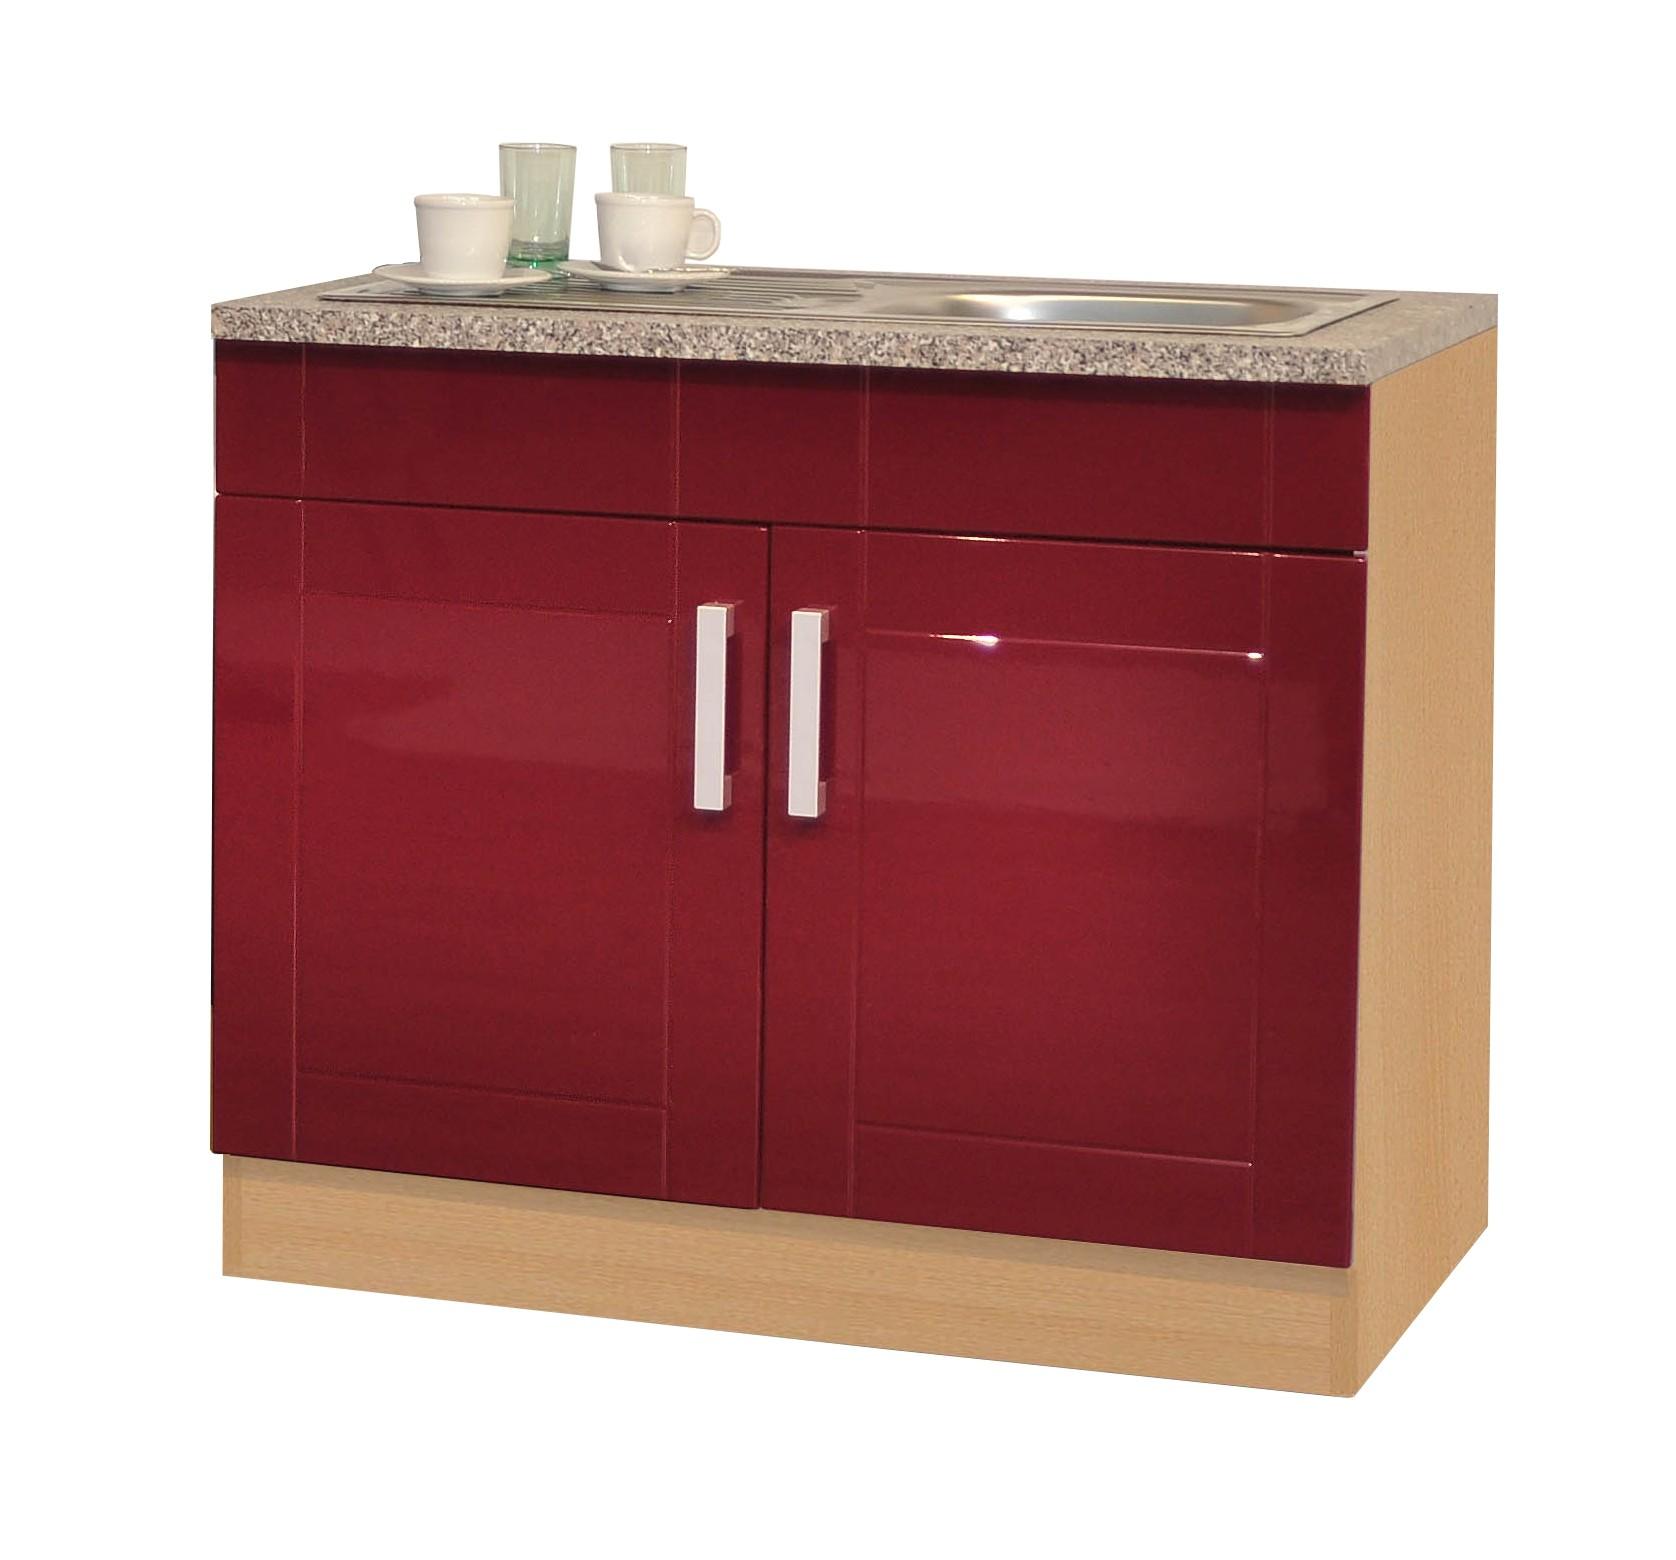 k chen sp lenschrank varel sp lschrank 2 t ren 100 cm hochglanz bordeaux rot ebay. Black Bedroom Furniture Sets. Home Design Ideas